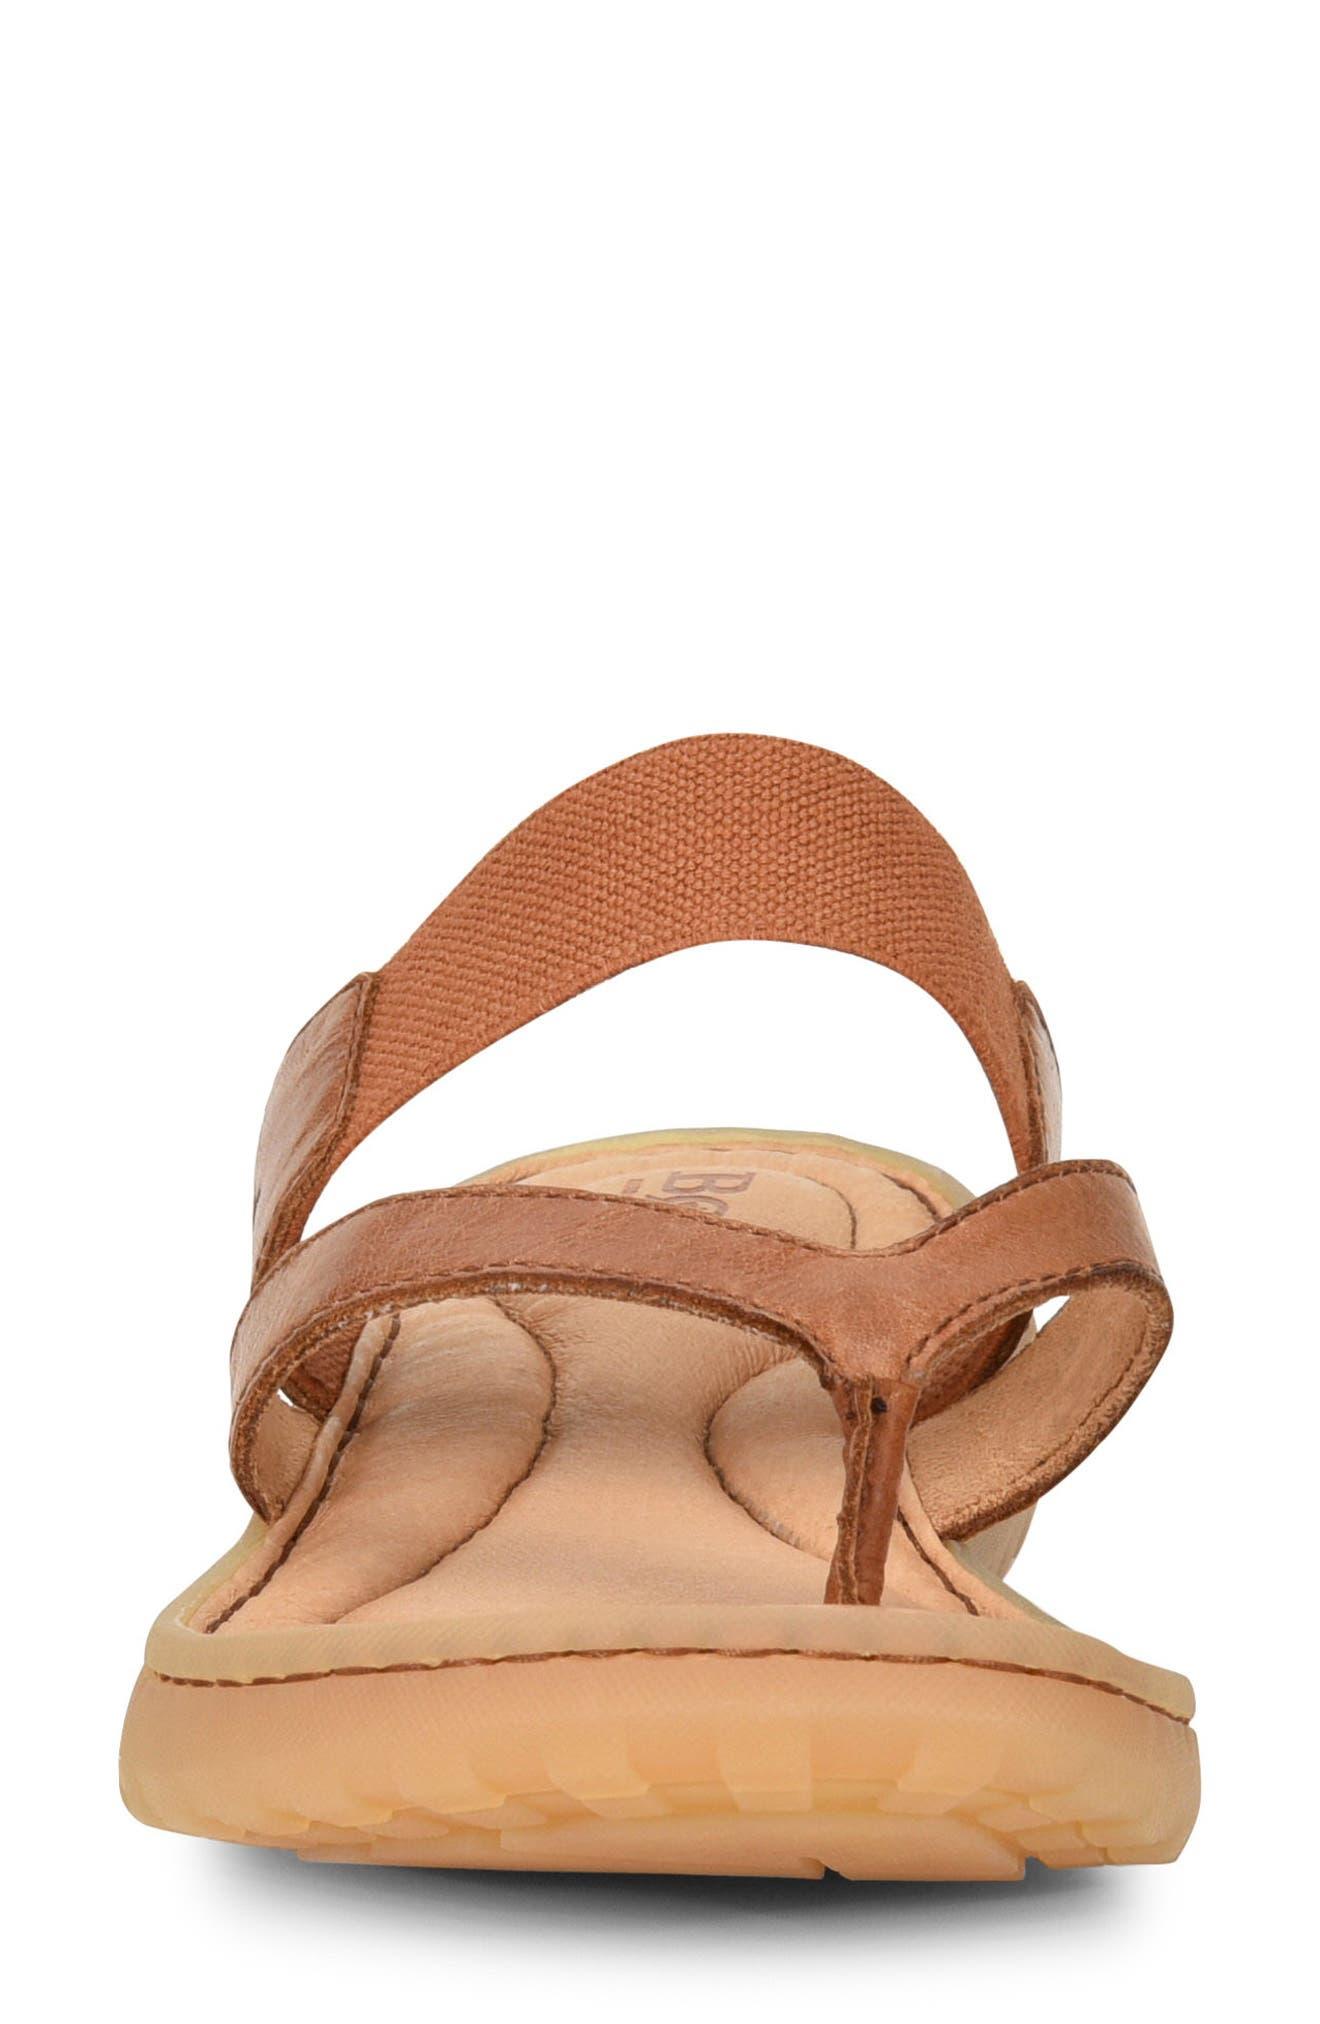 Nevis Sandal,                             Alternate thumbnail 4, color,                             Brown Leather